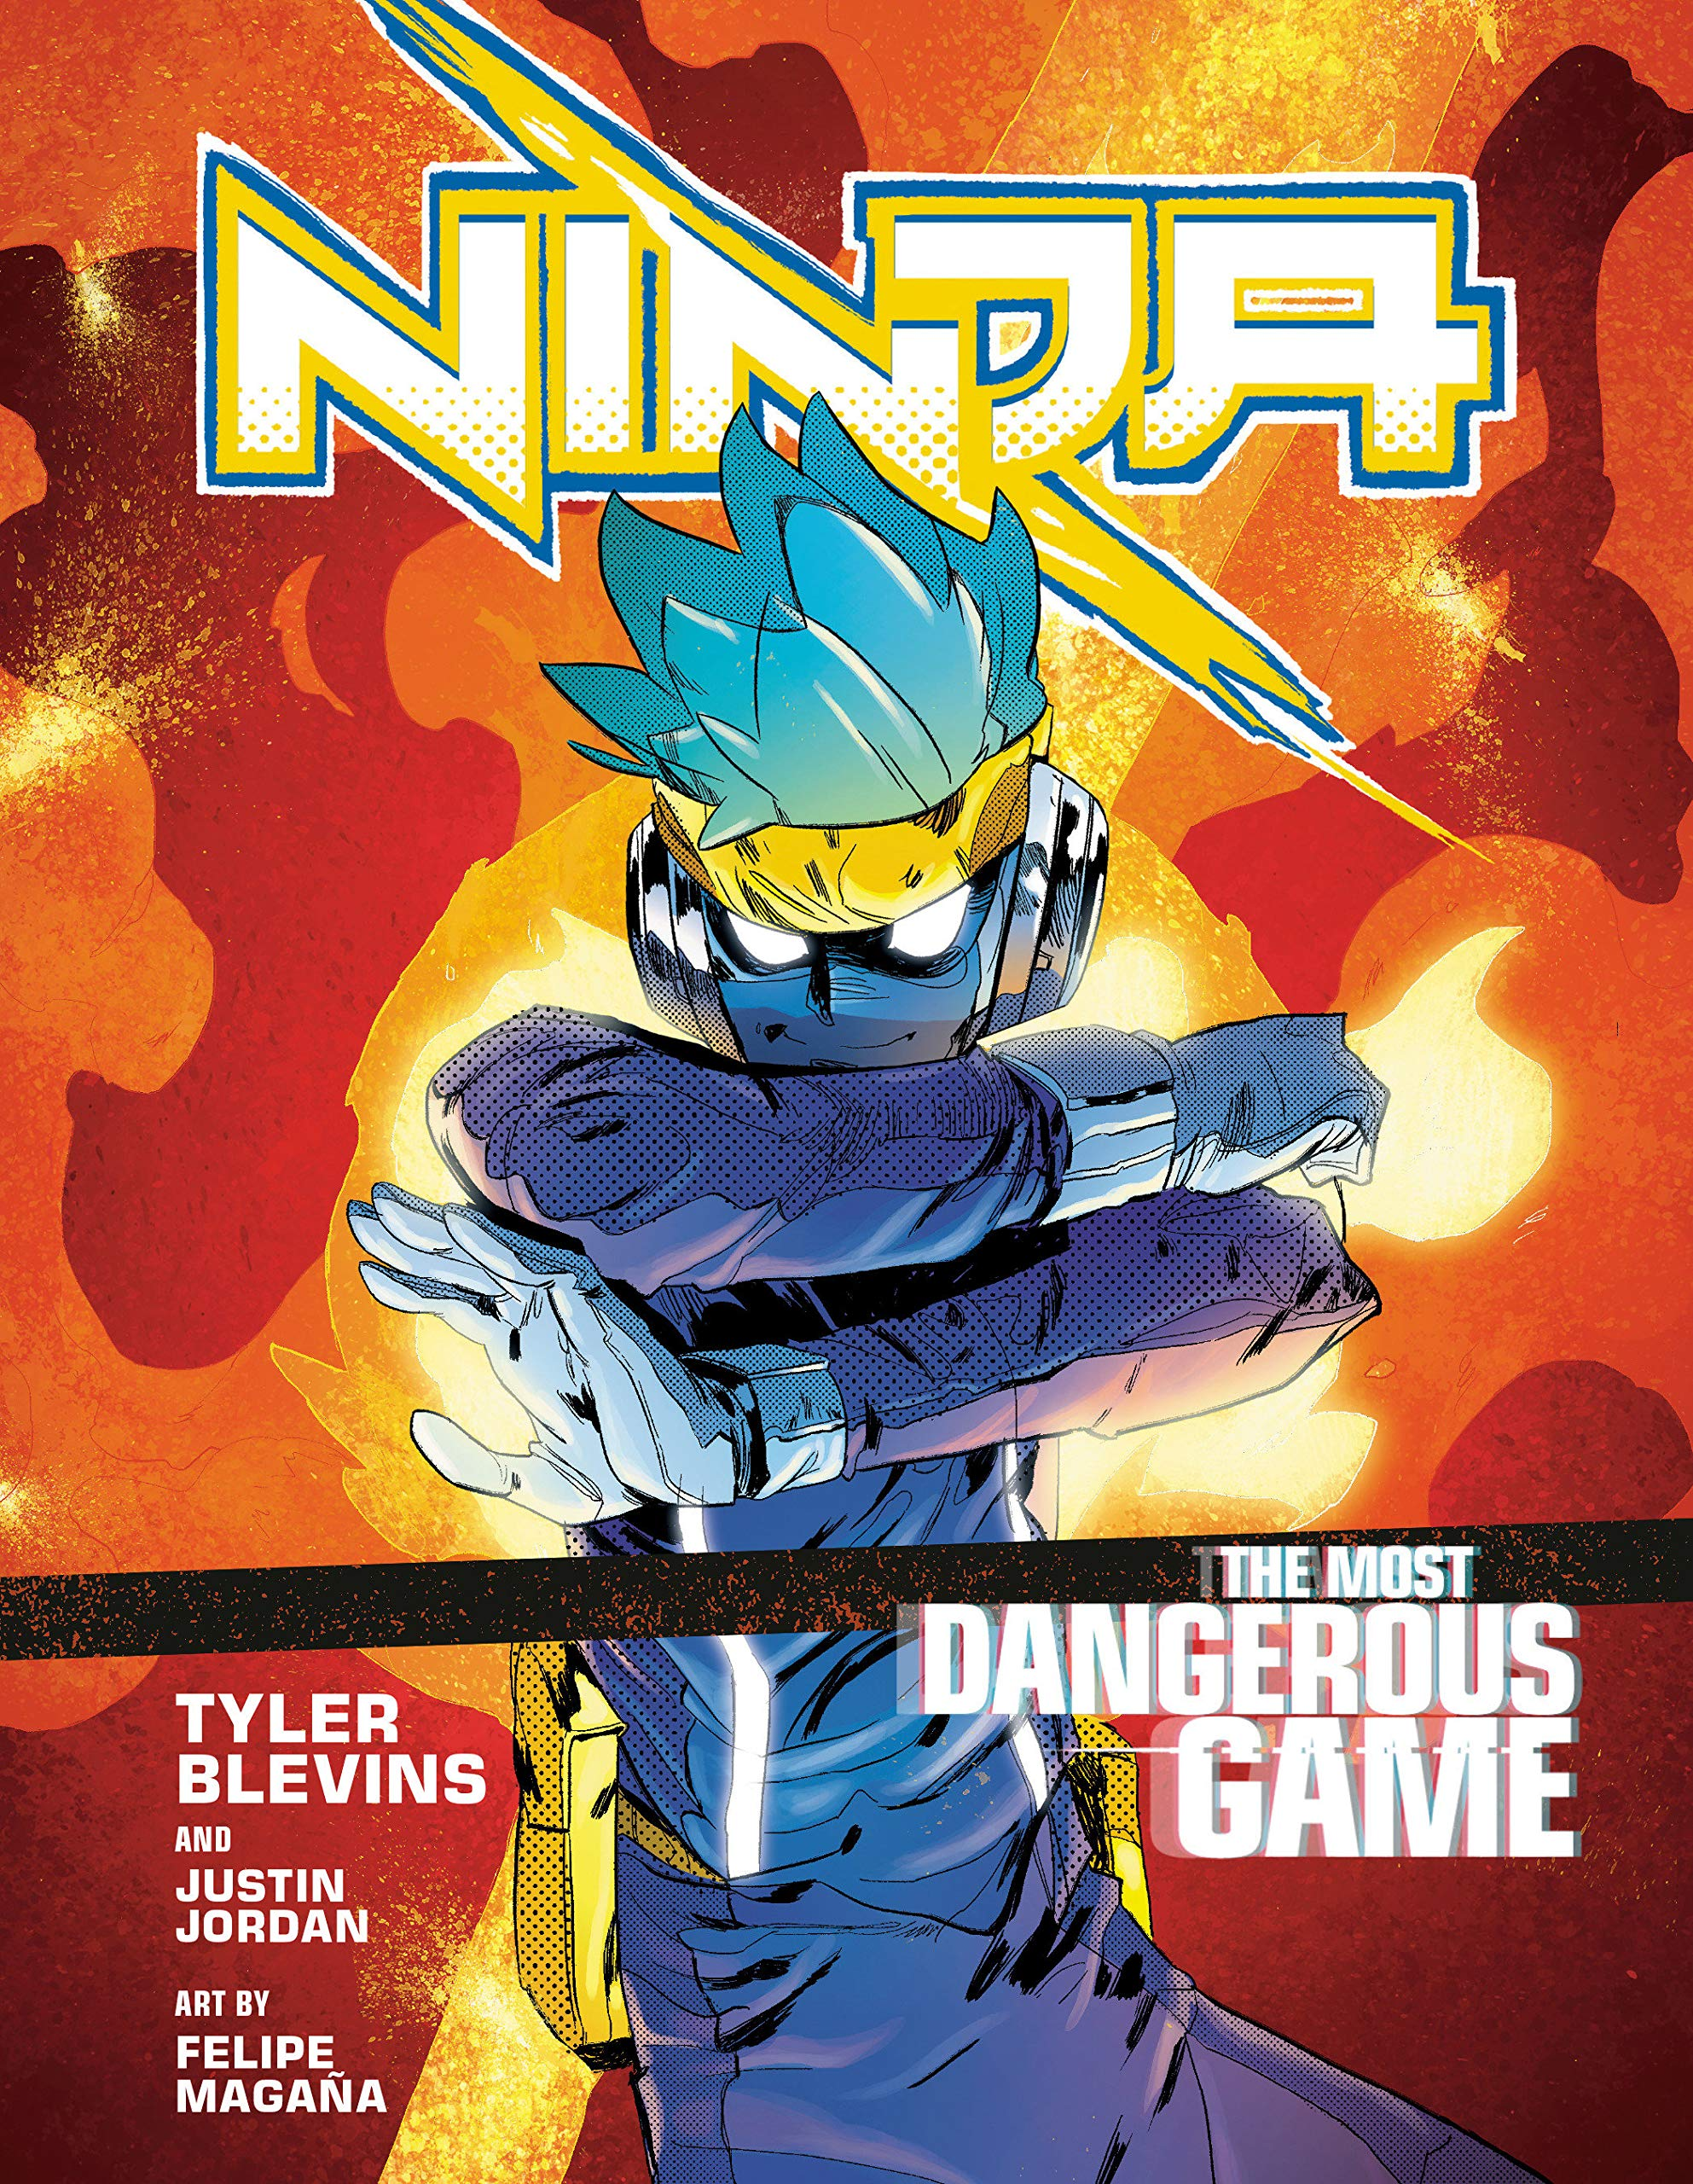 "Ninja: The Most Dangerous Game: [A Graphic Novel]: Amazon.ca: Blevins,  Tyler ""Ninja"", Jordan, Justin, Magaña, Felipe: Books"